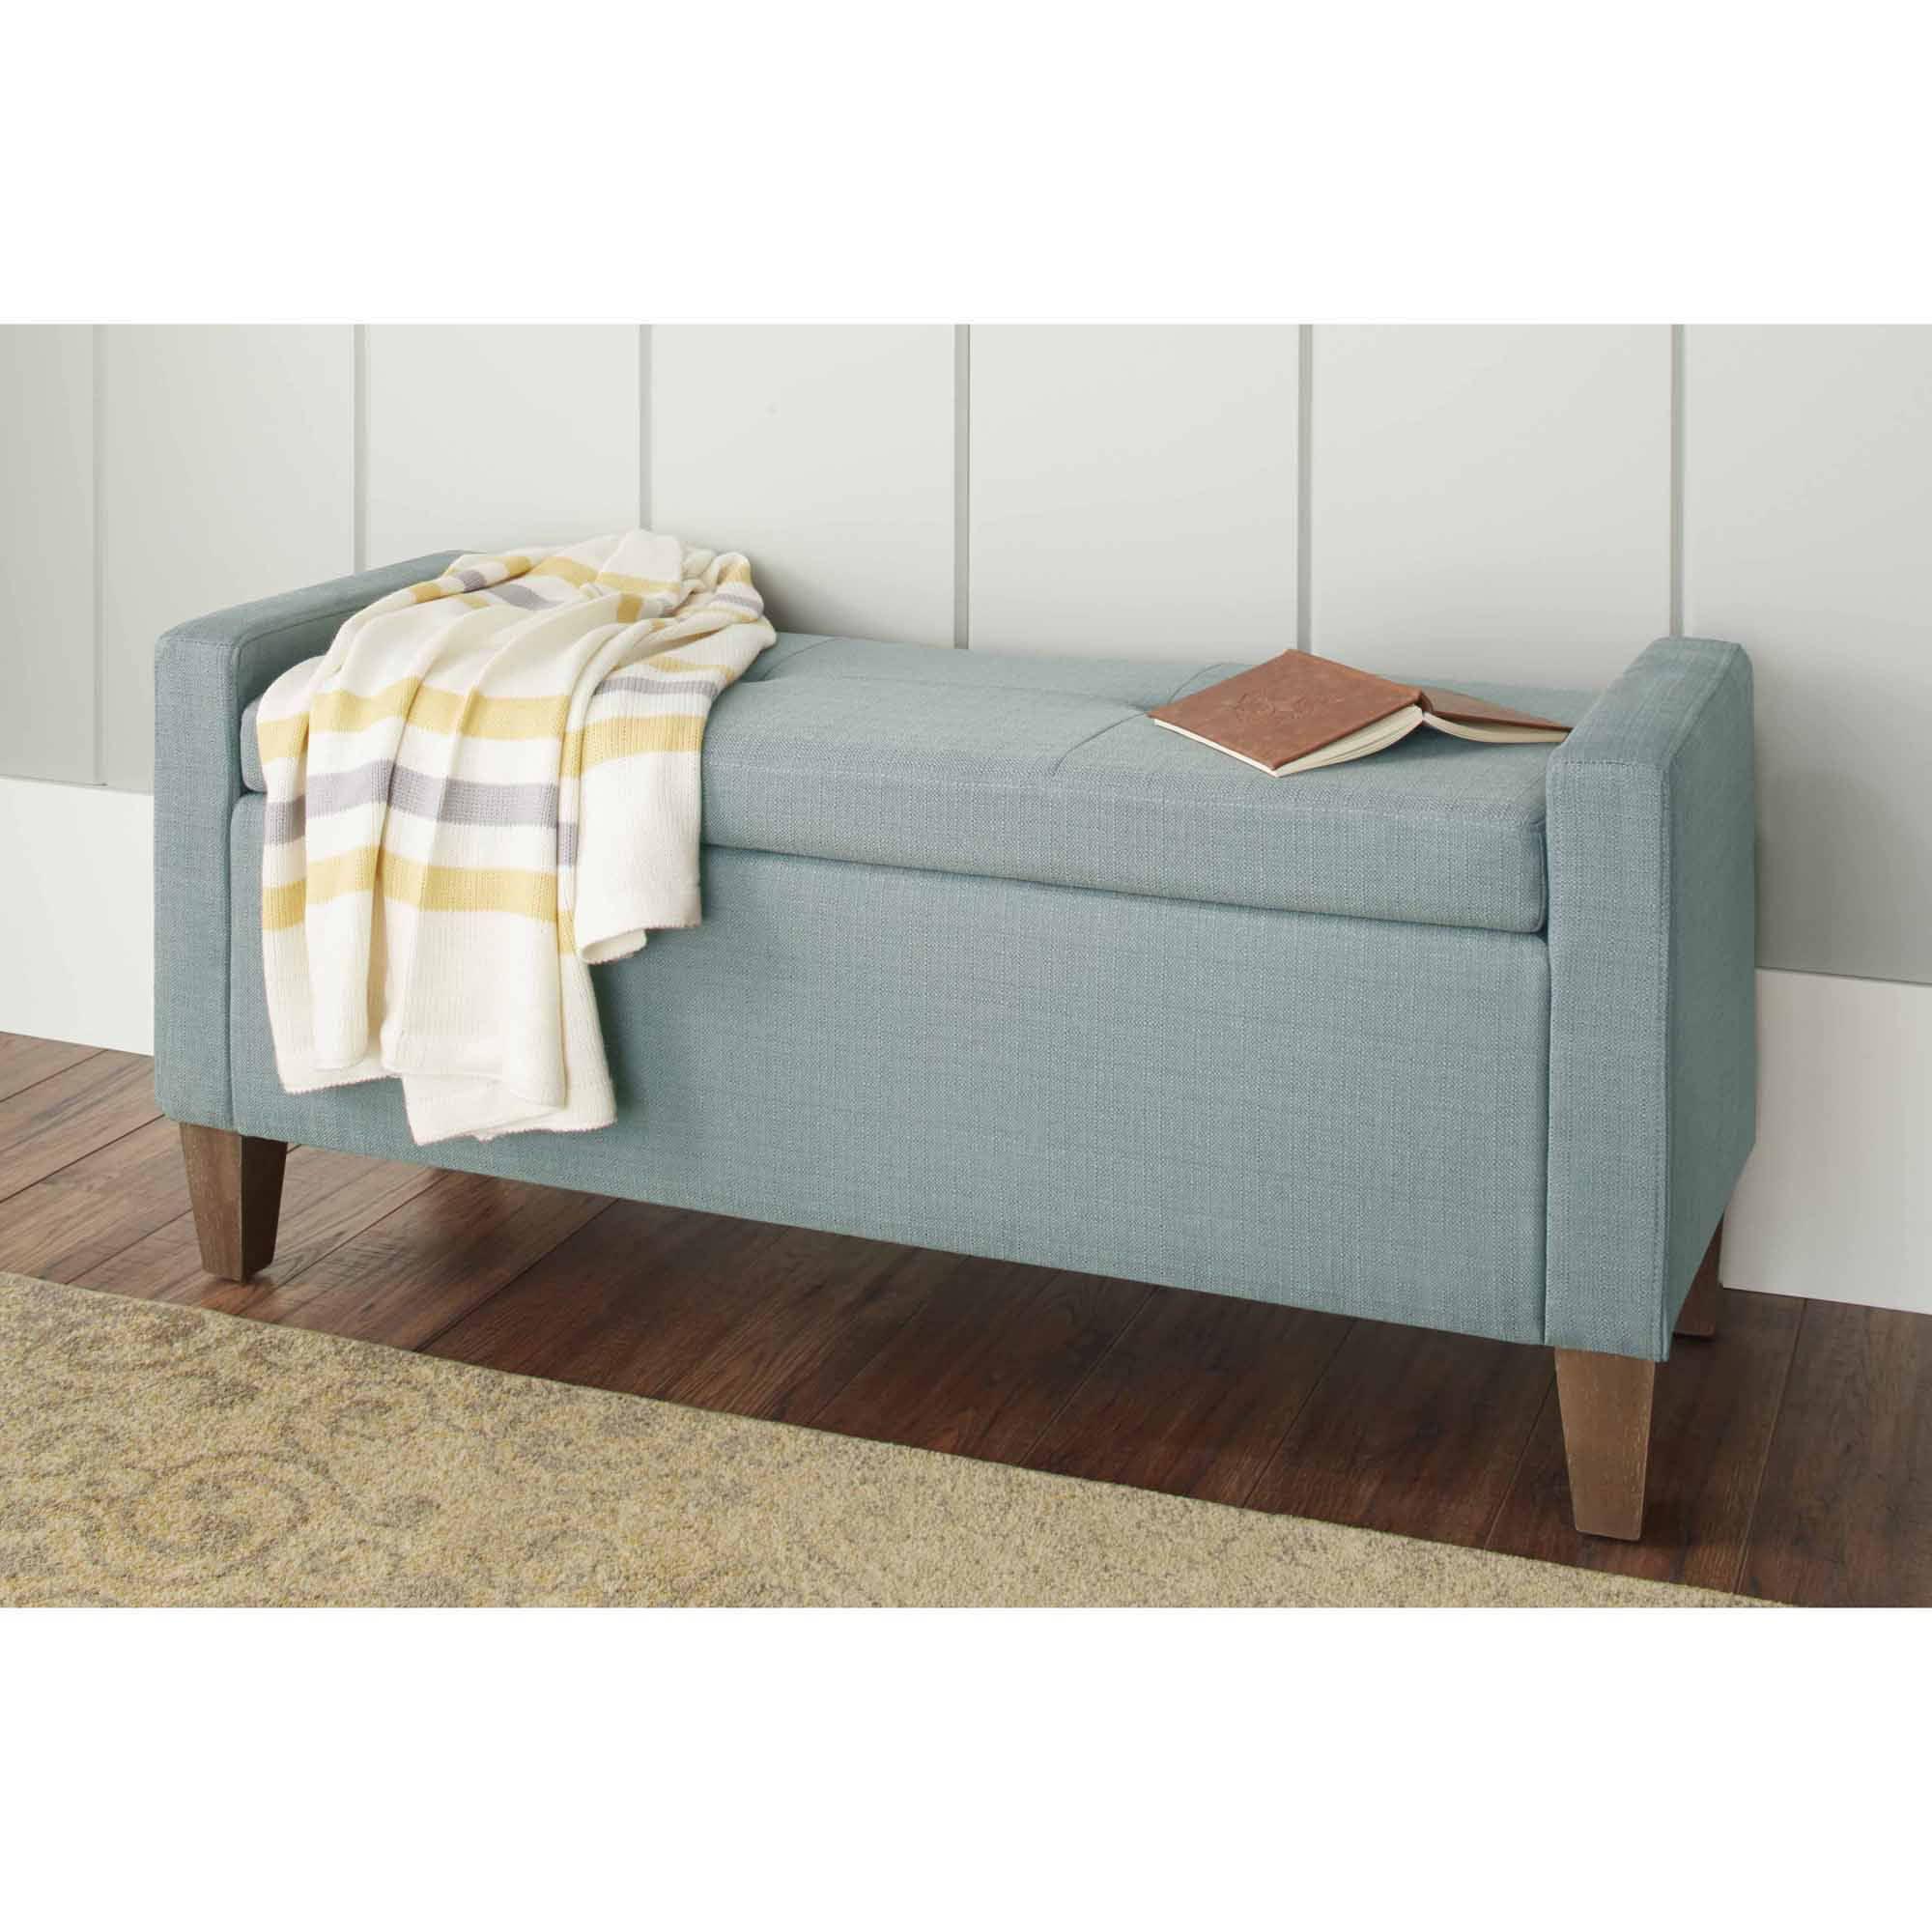 Best 25  Bedroom bench with storage ideas on Pinterest | Corner ...